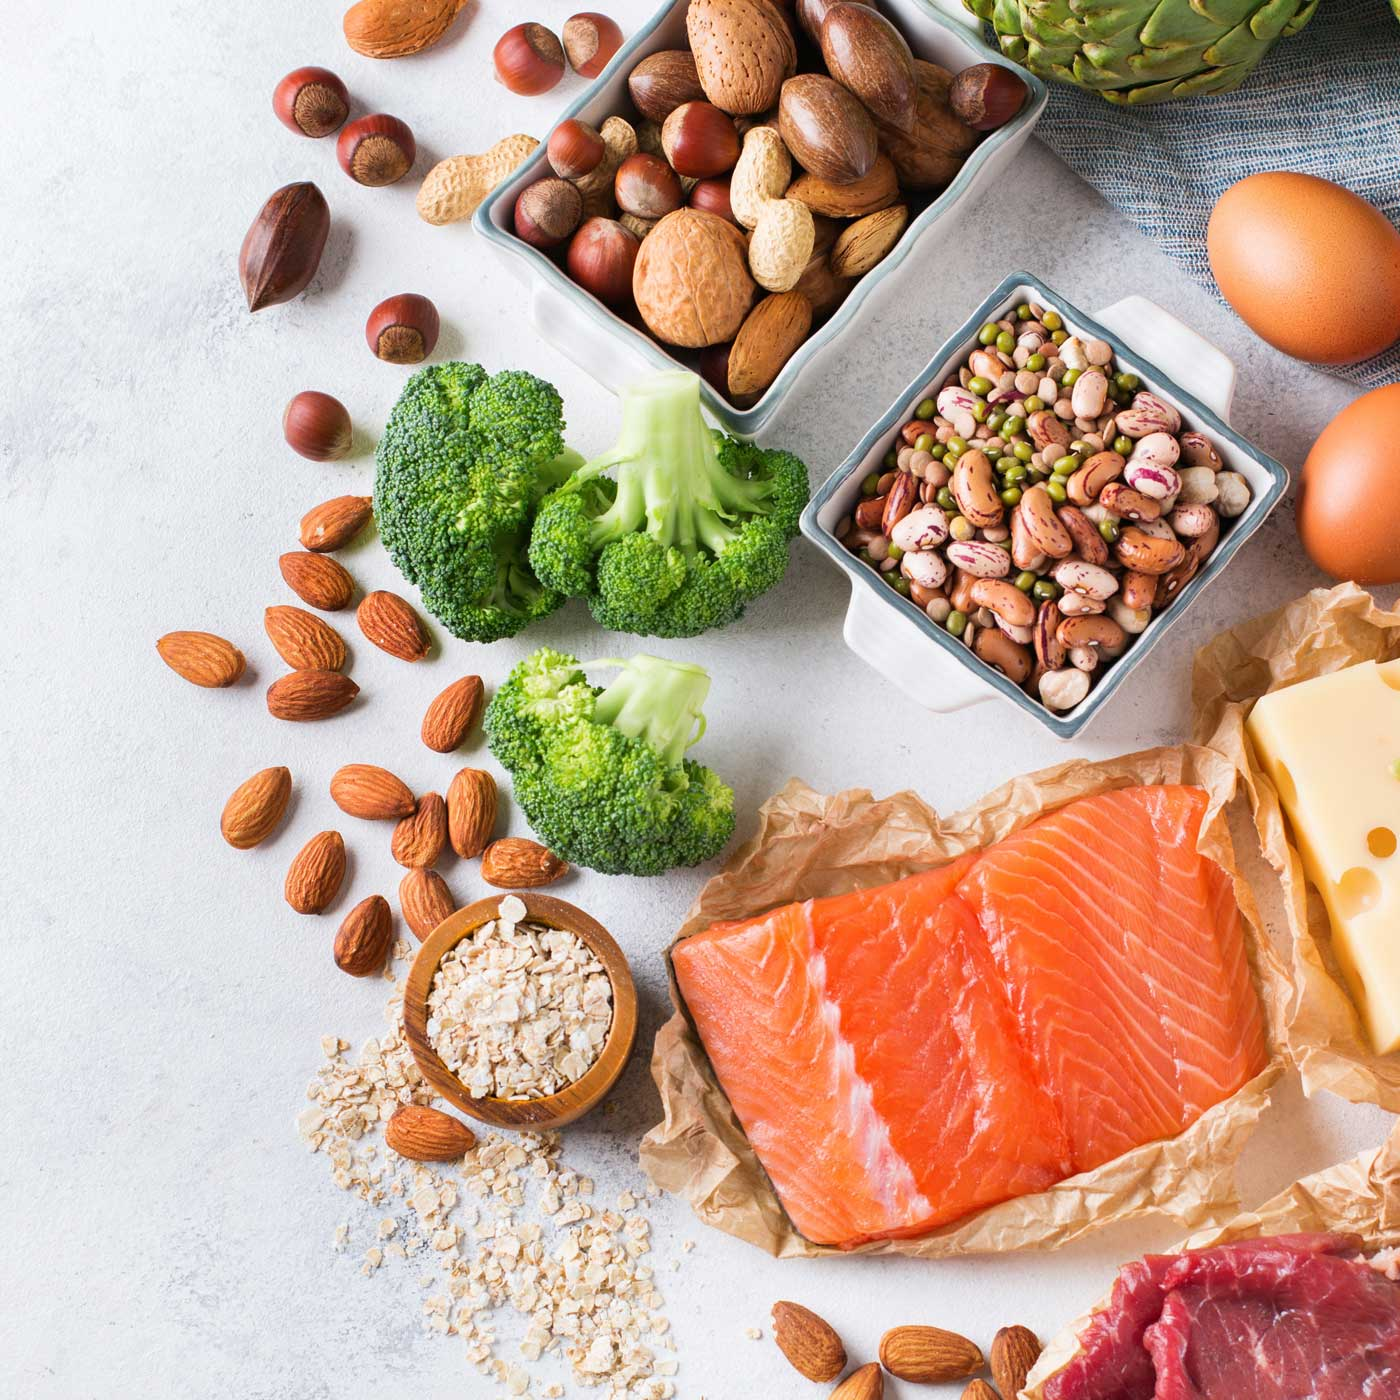 Naturopathic Dietry Advice